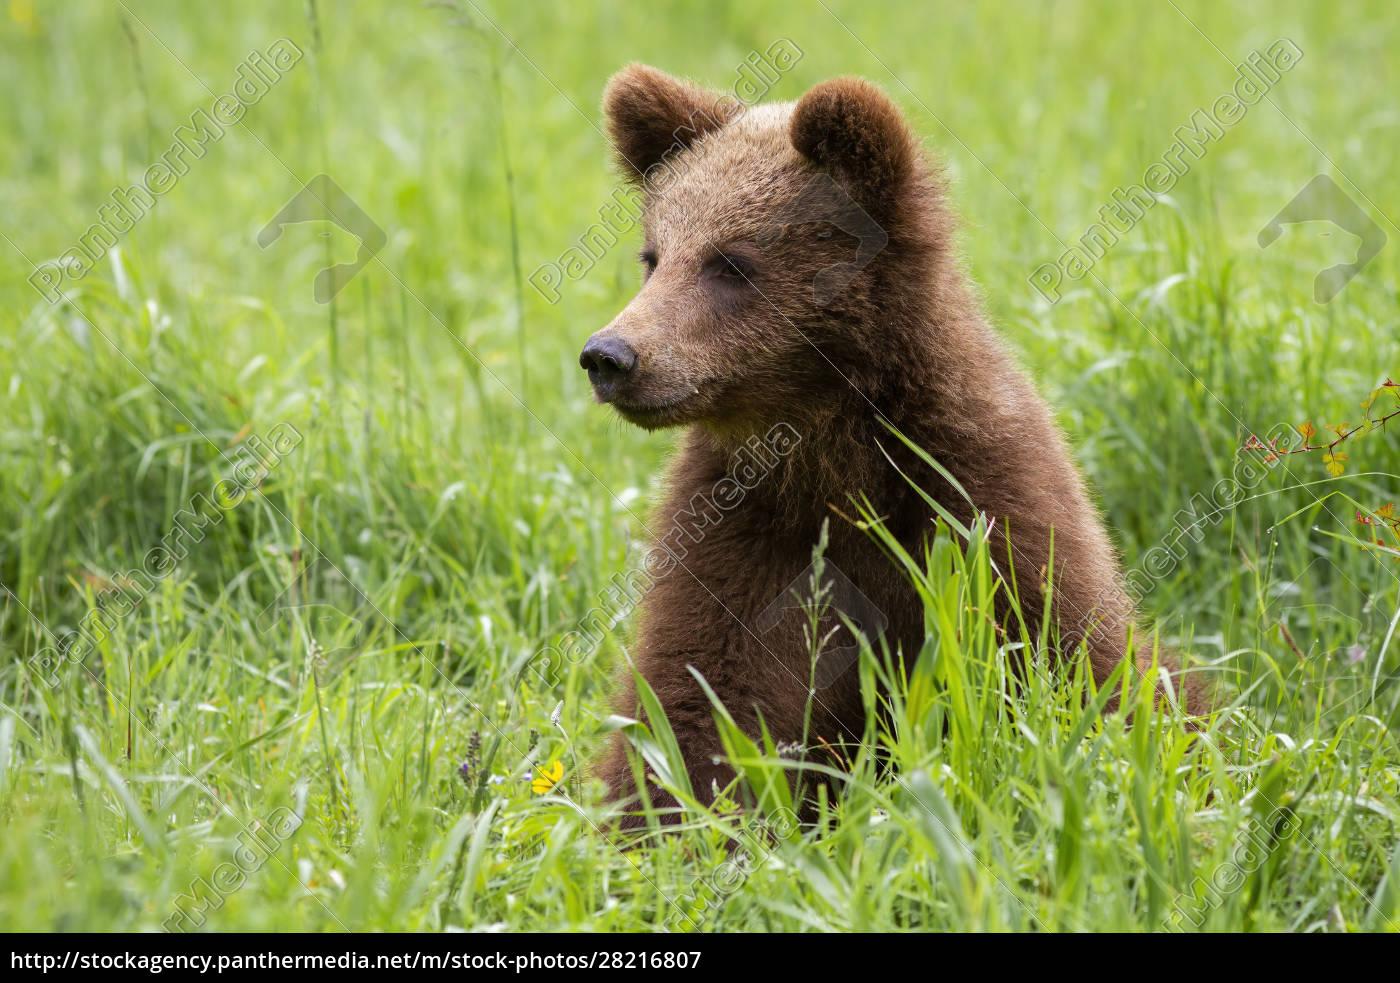 adorable, brown, bear, cub, sitting, in - 28216807